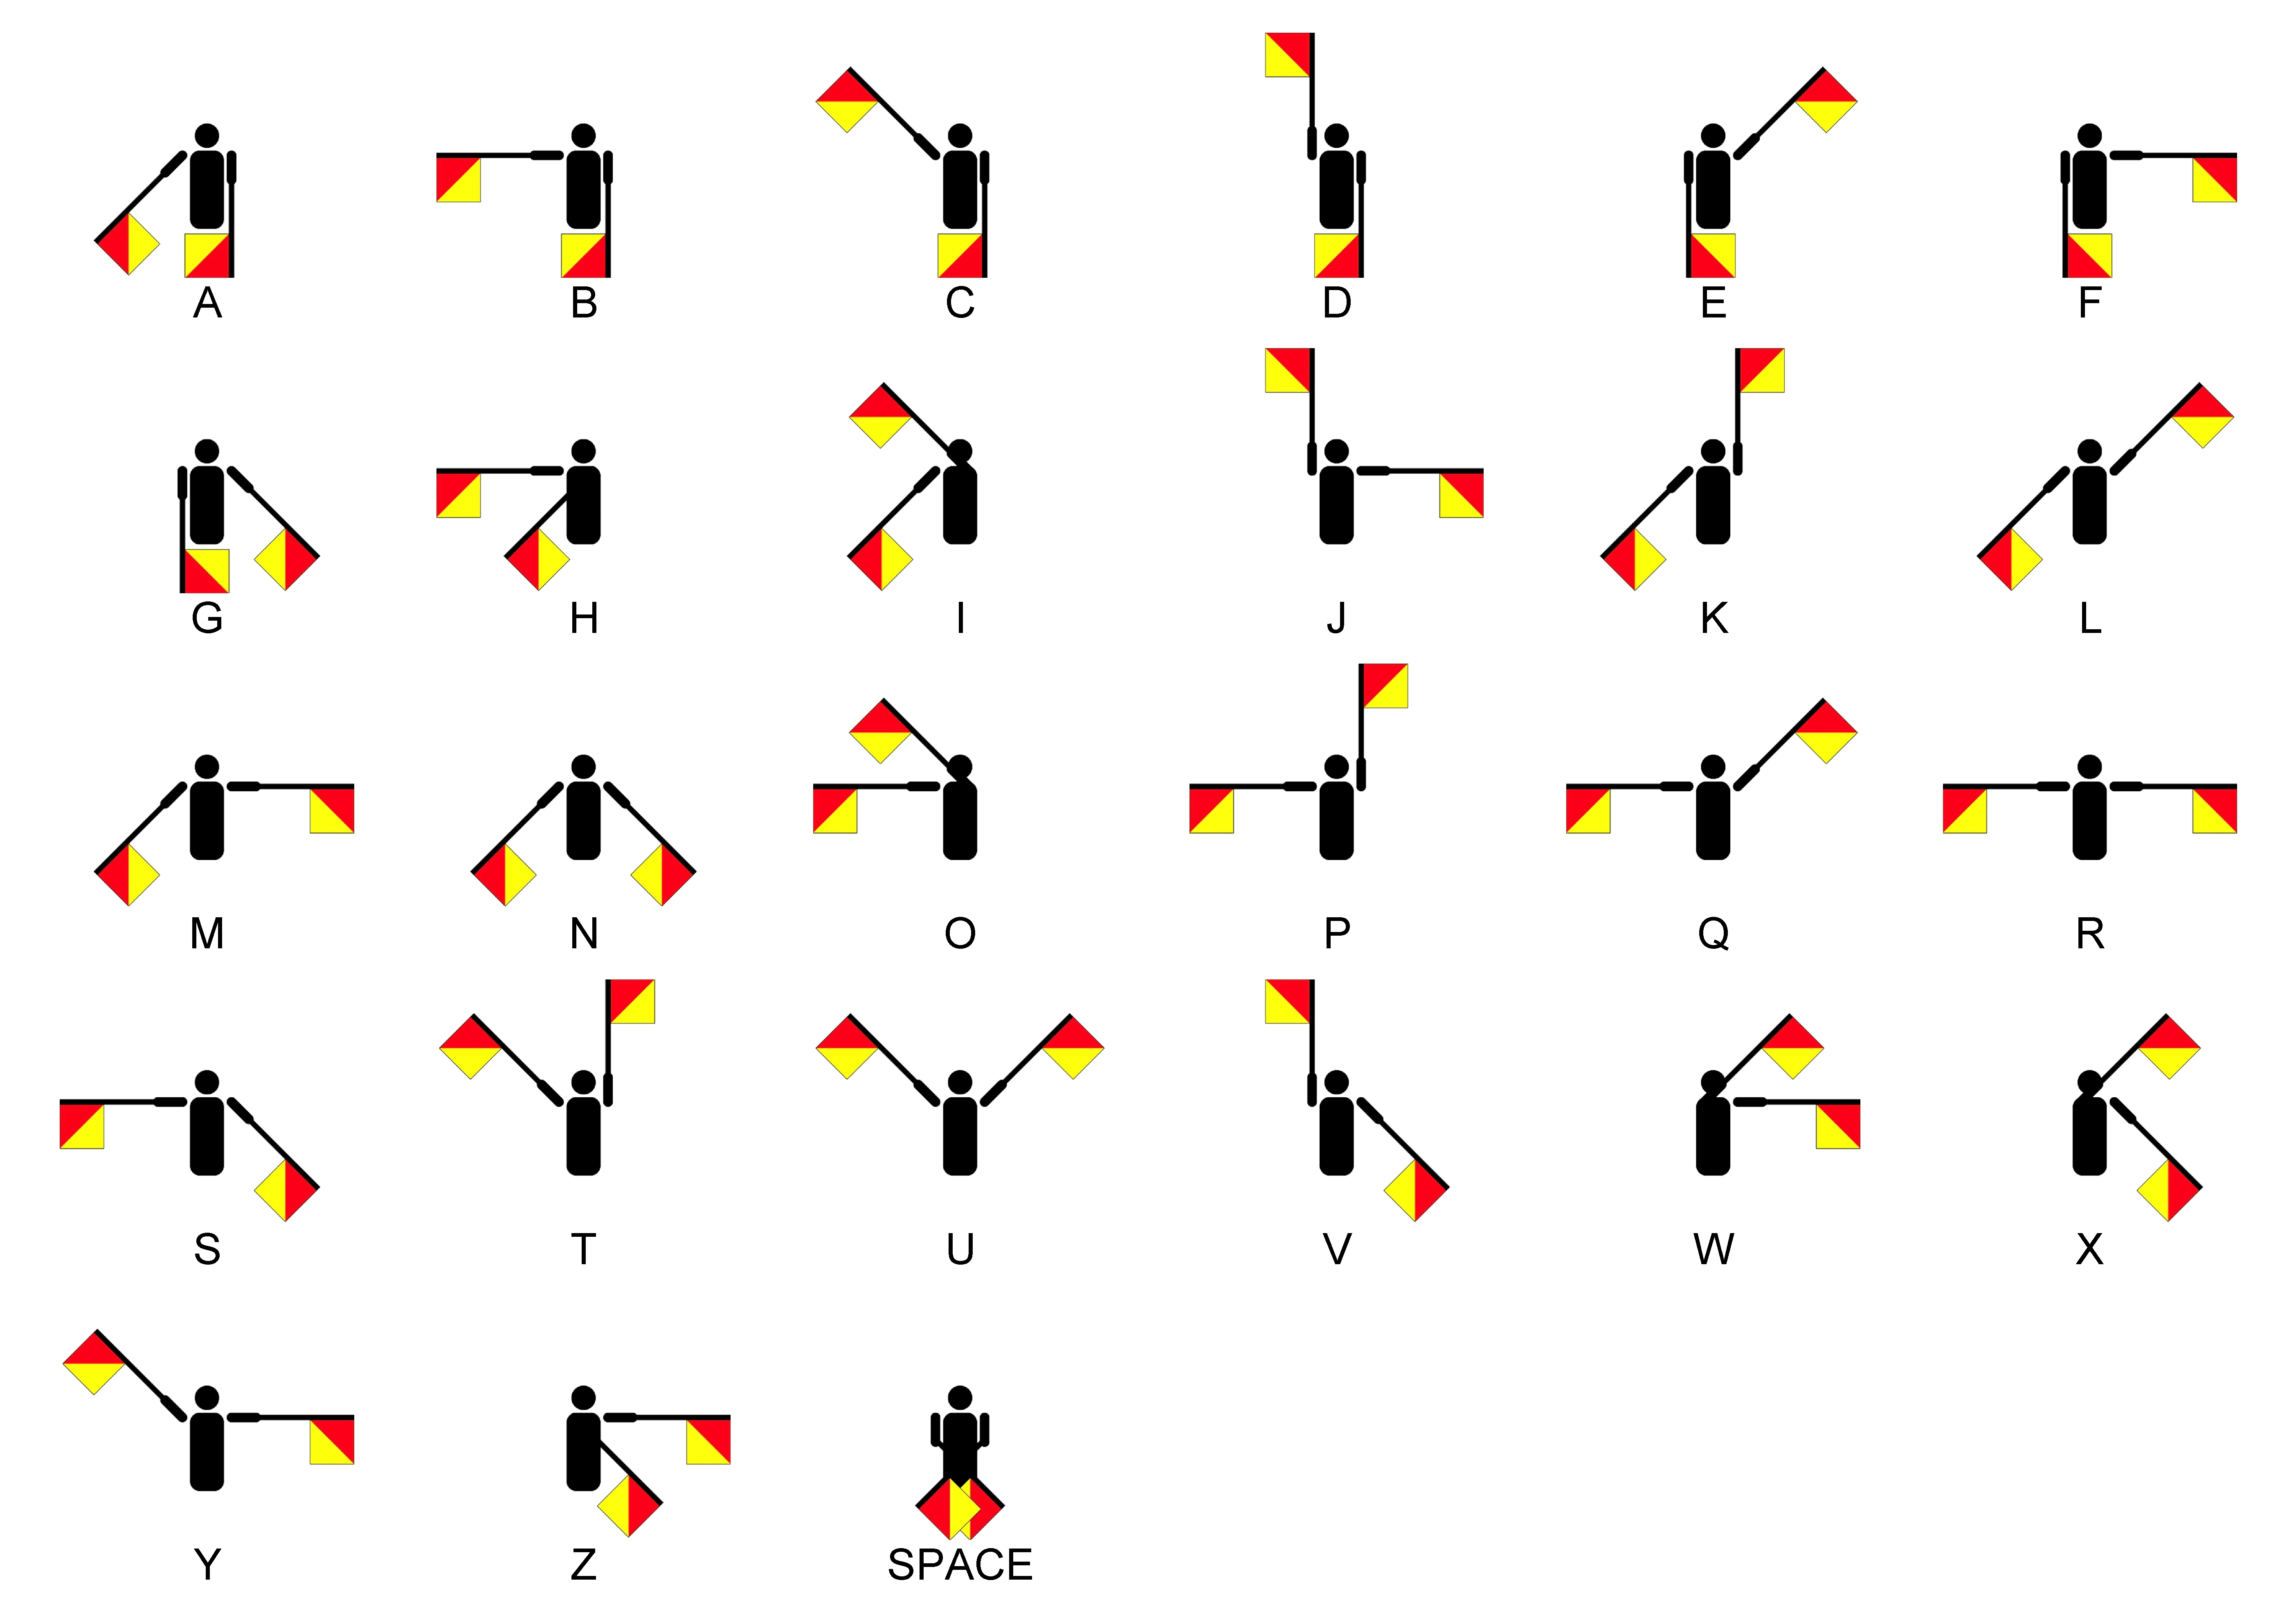 File:Semaphore Signals A-Z.jpg